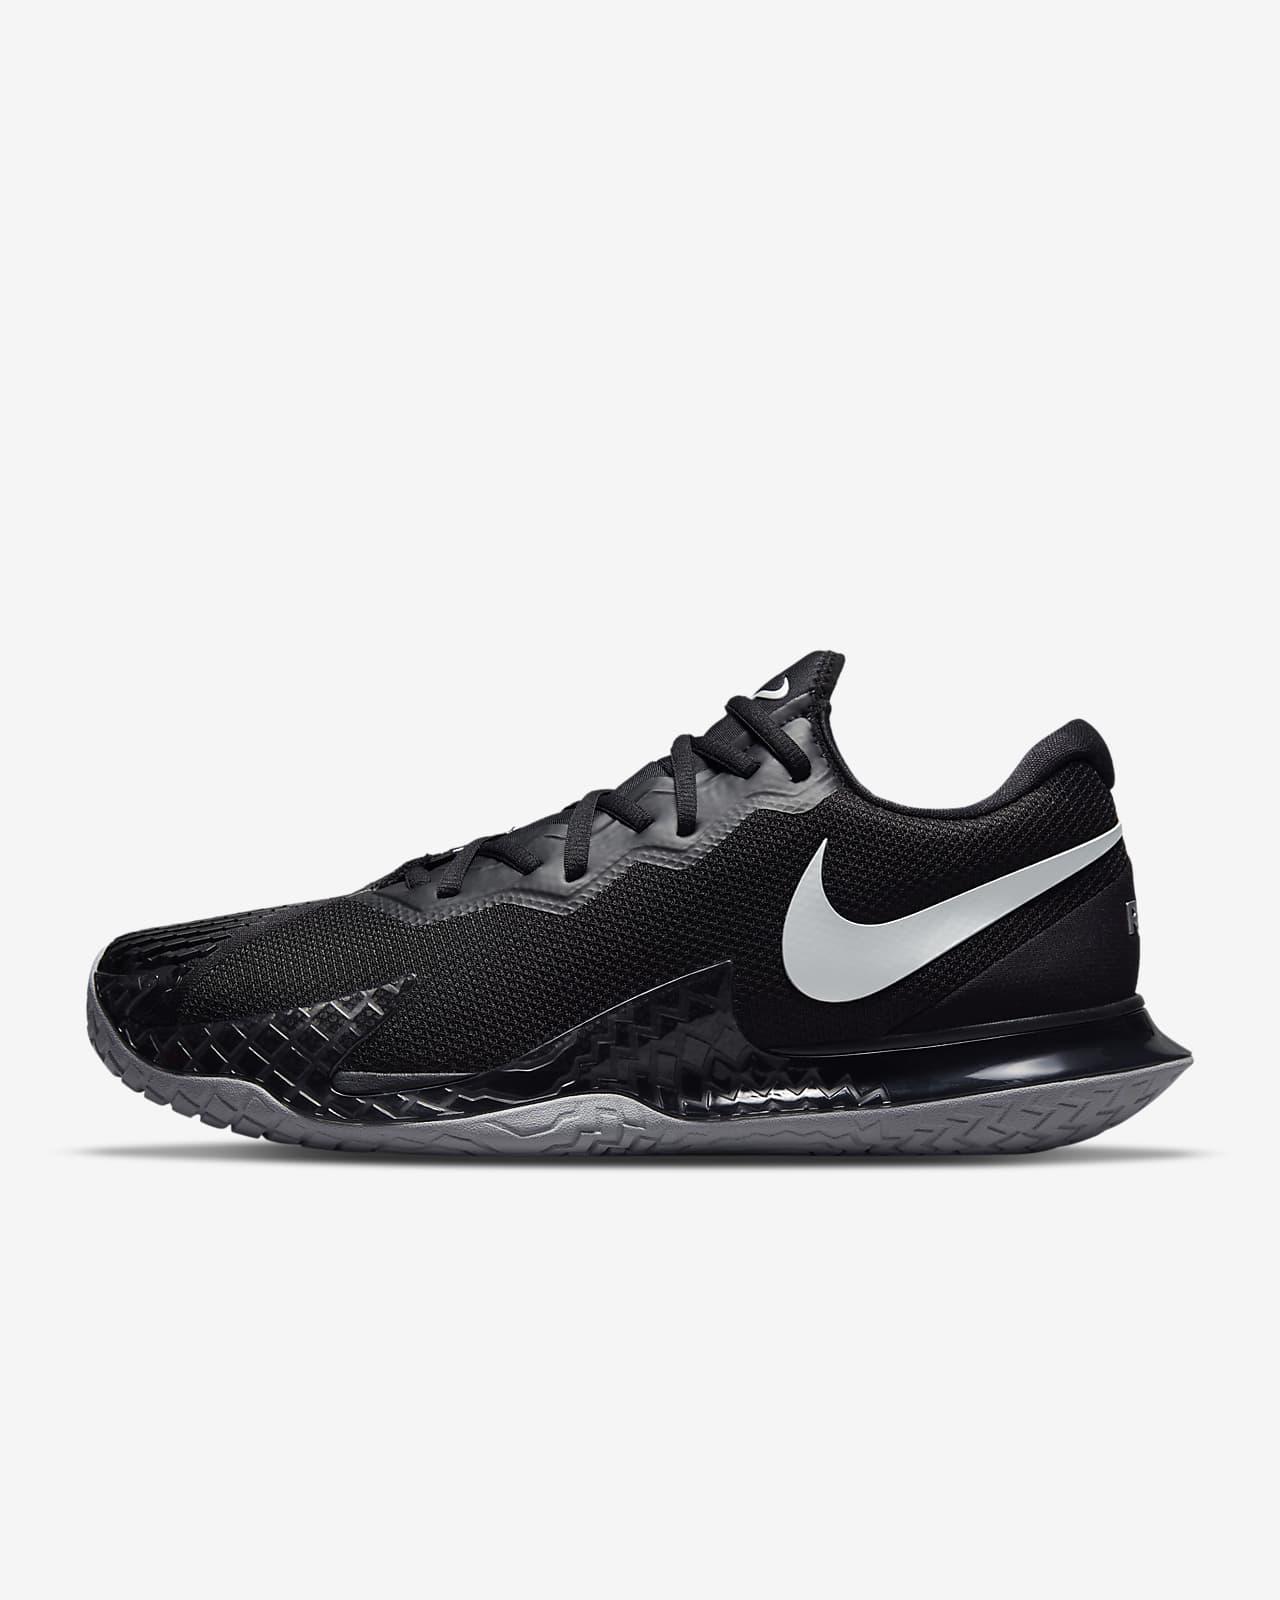 NikeCourt Zoom Vapor Cage 4 Rafa Men's Hard Court Tennis Shoes